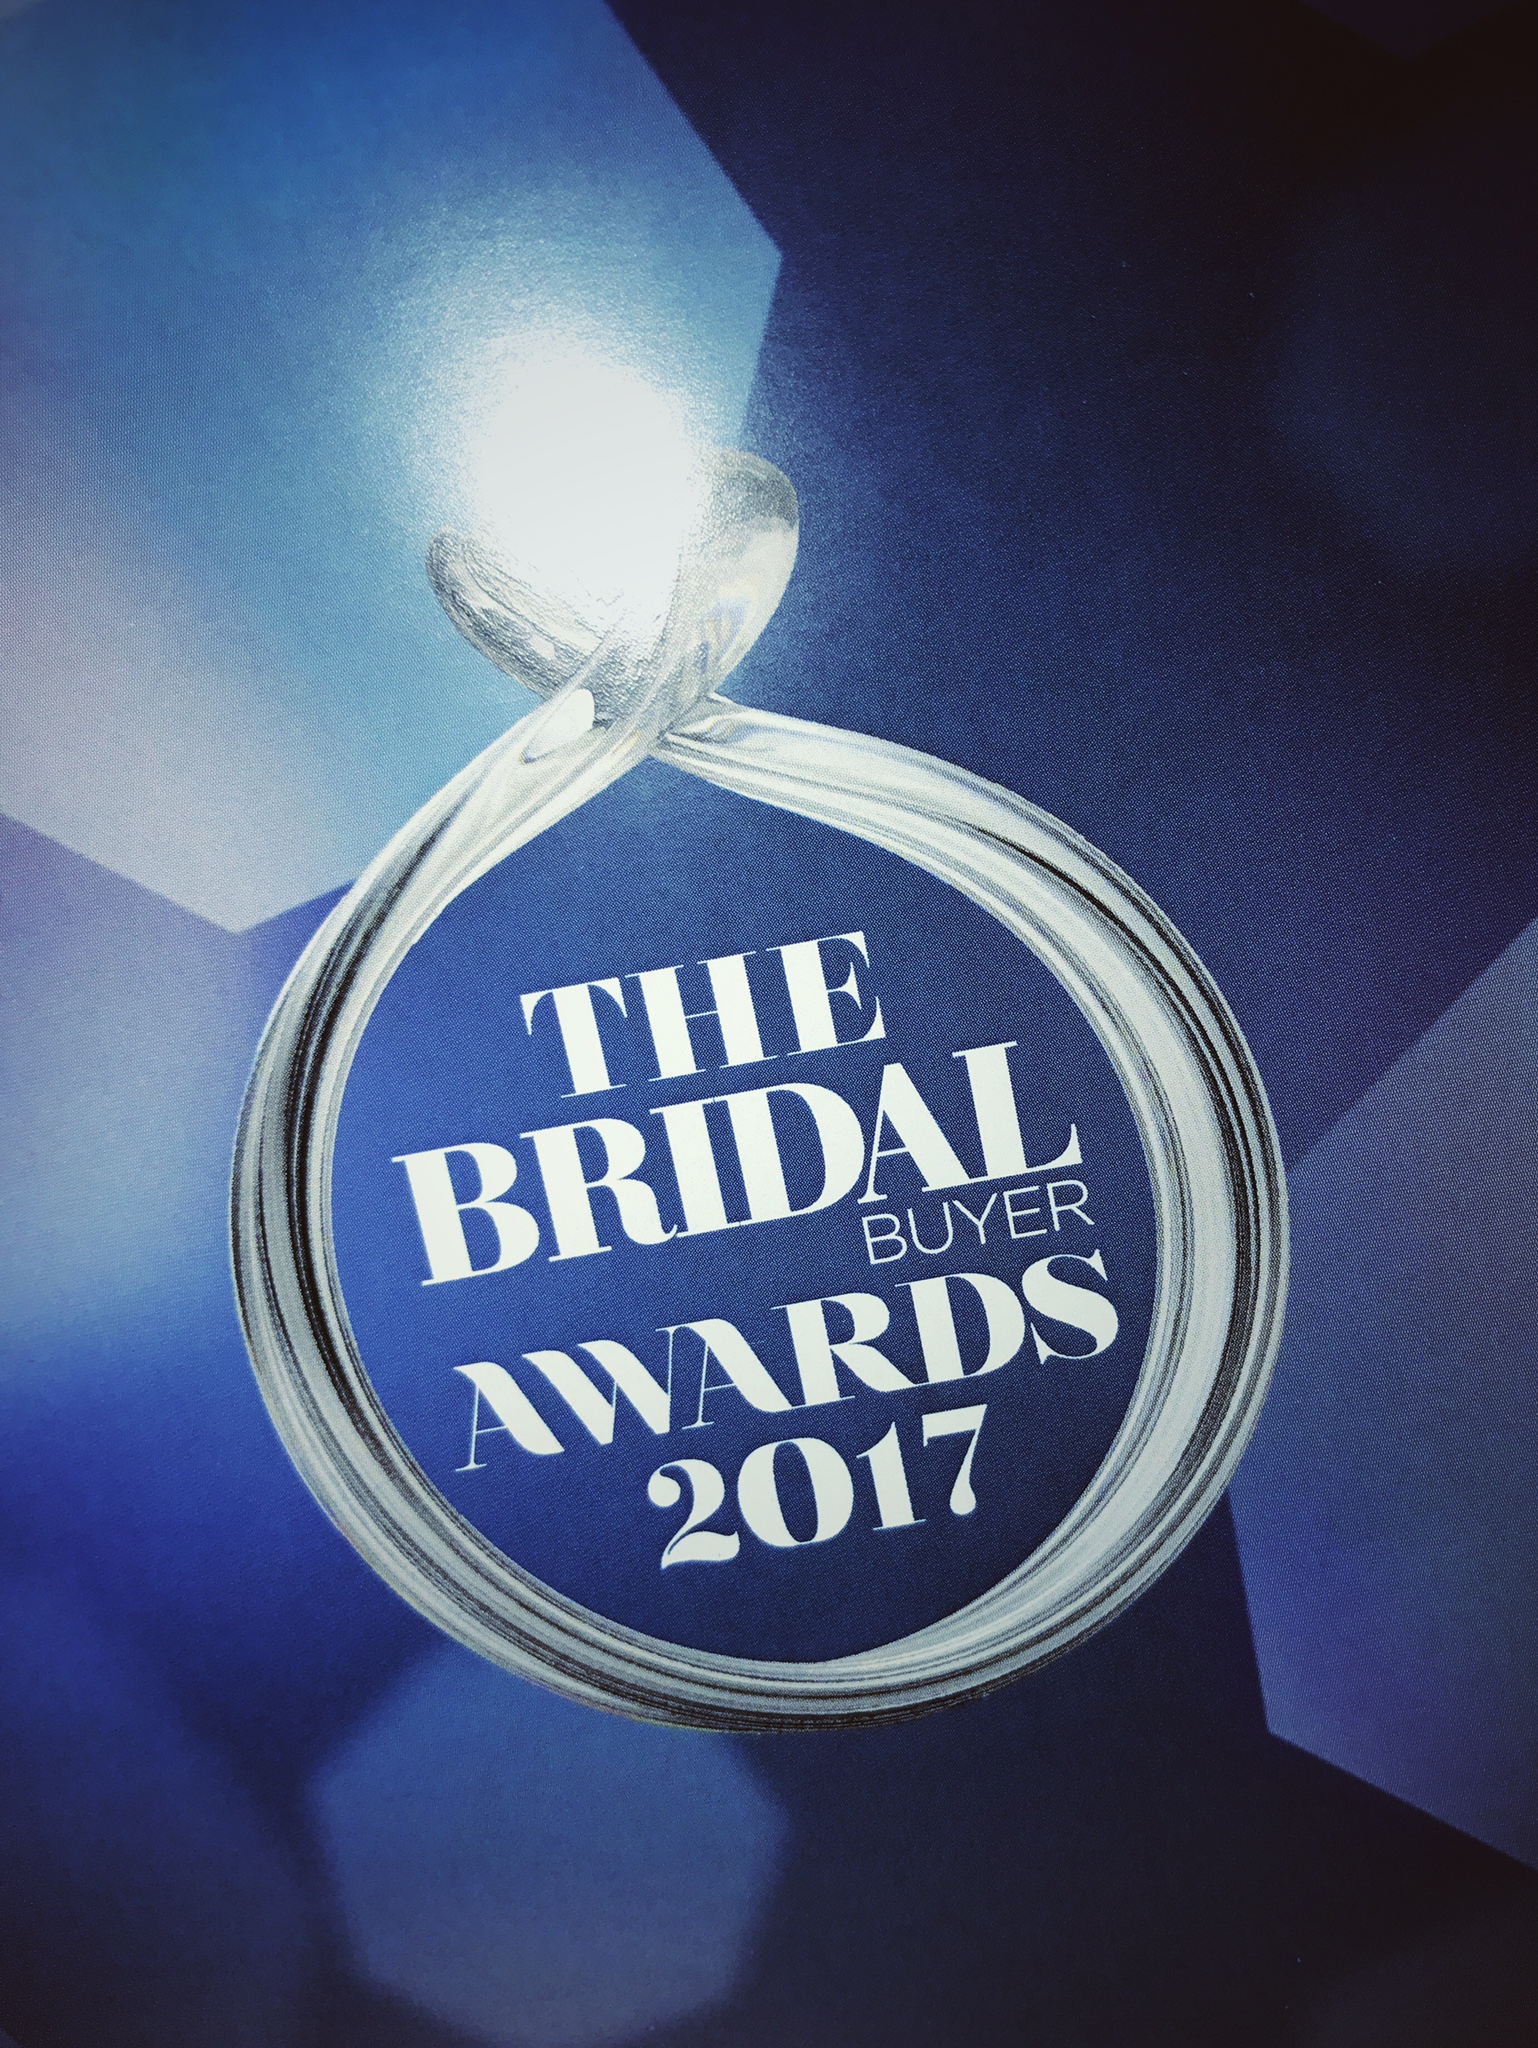 best-new-bridal-retailer-award.JPG